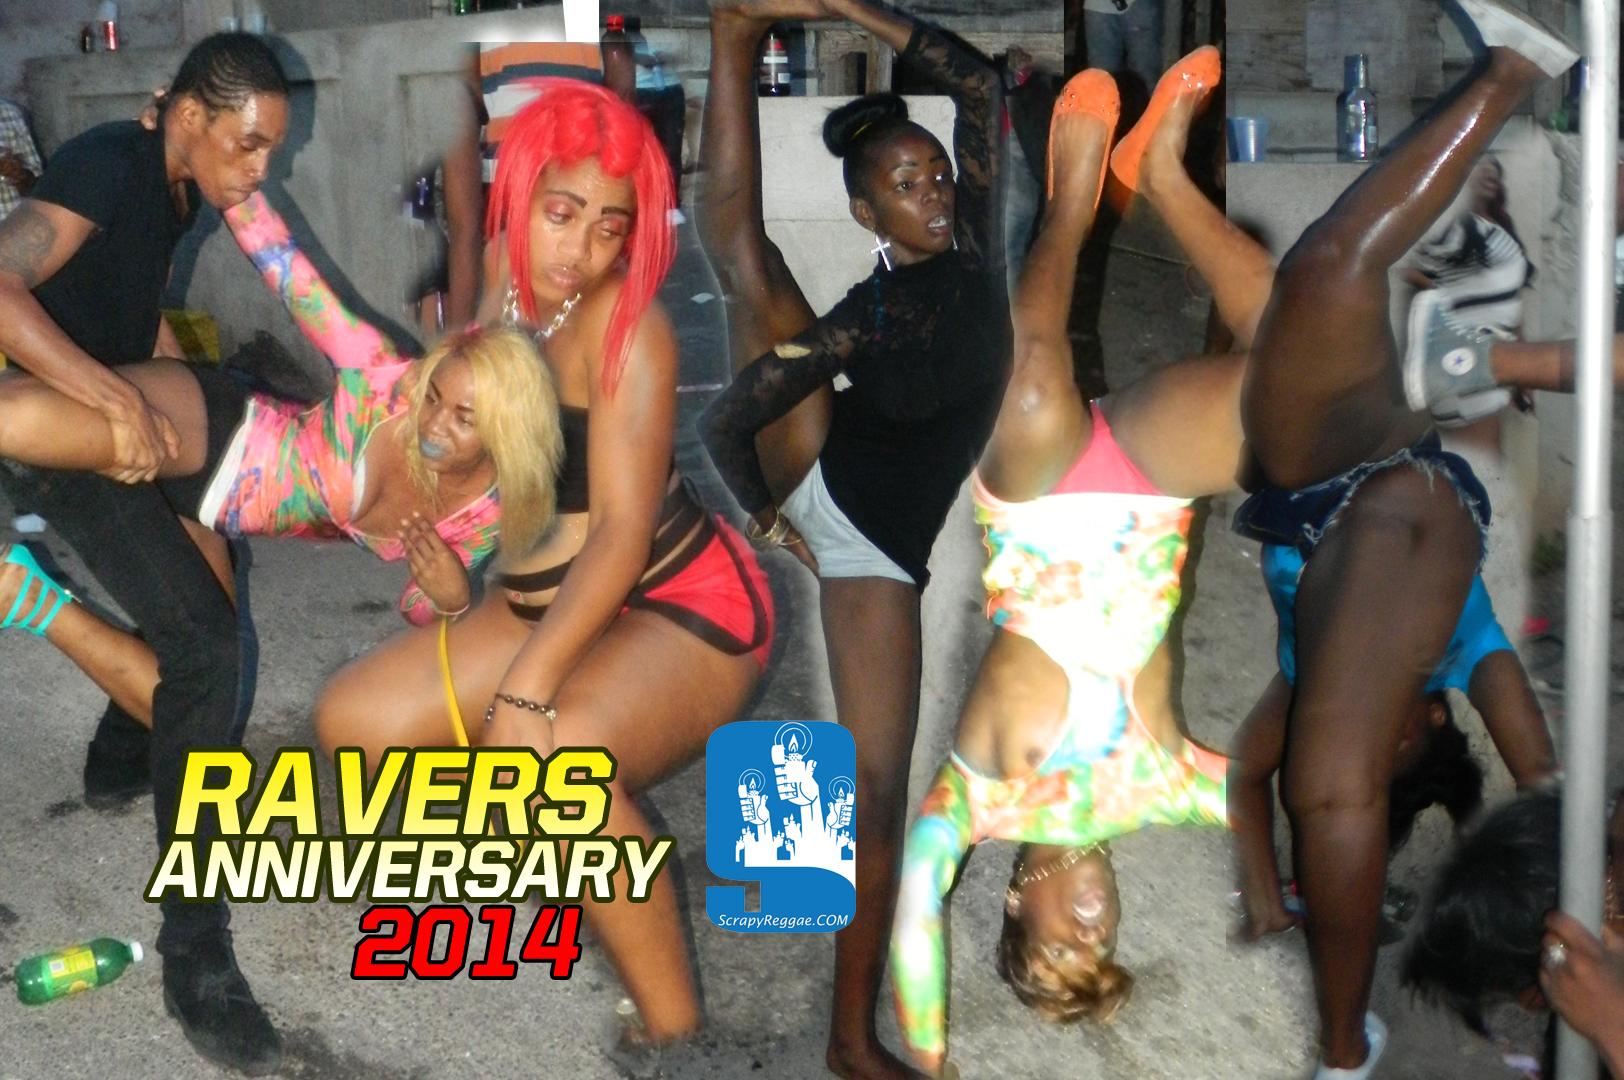 meet ravers online